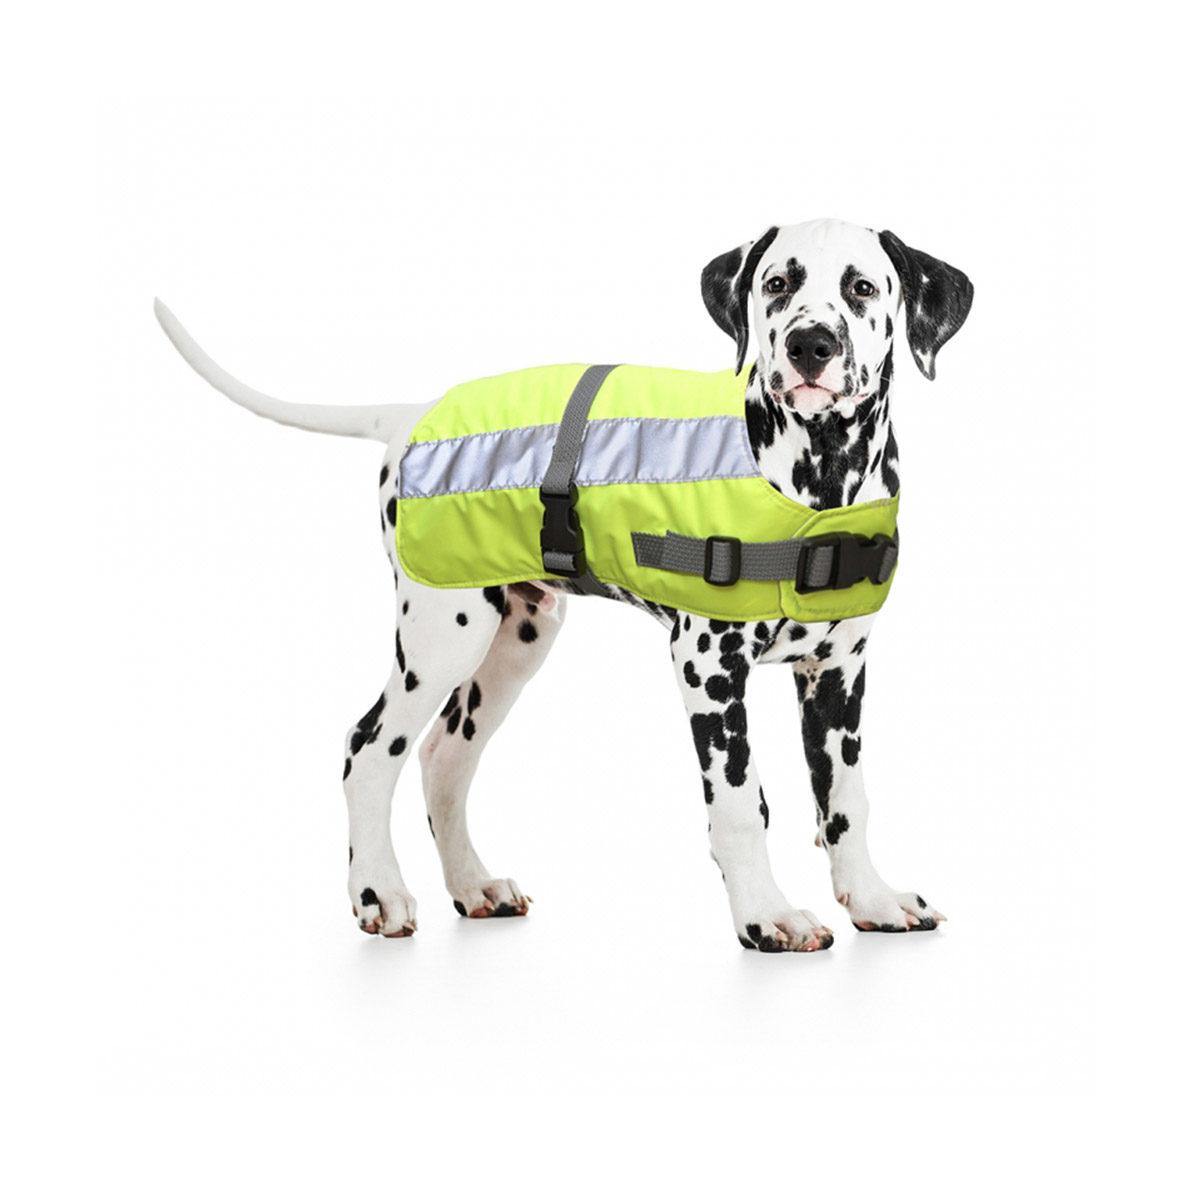 Duvo+ Flectalon Hi Vis Honden Jack Ruglengte 60 cm Geel - in Reflectie & Verlichting